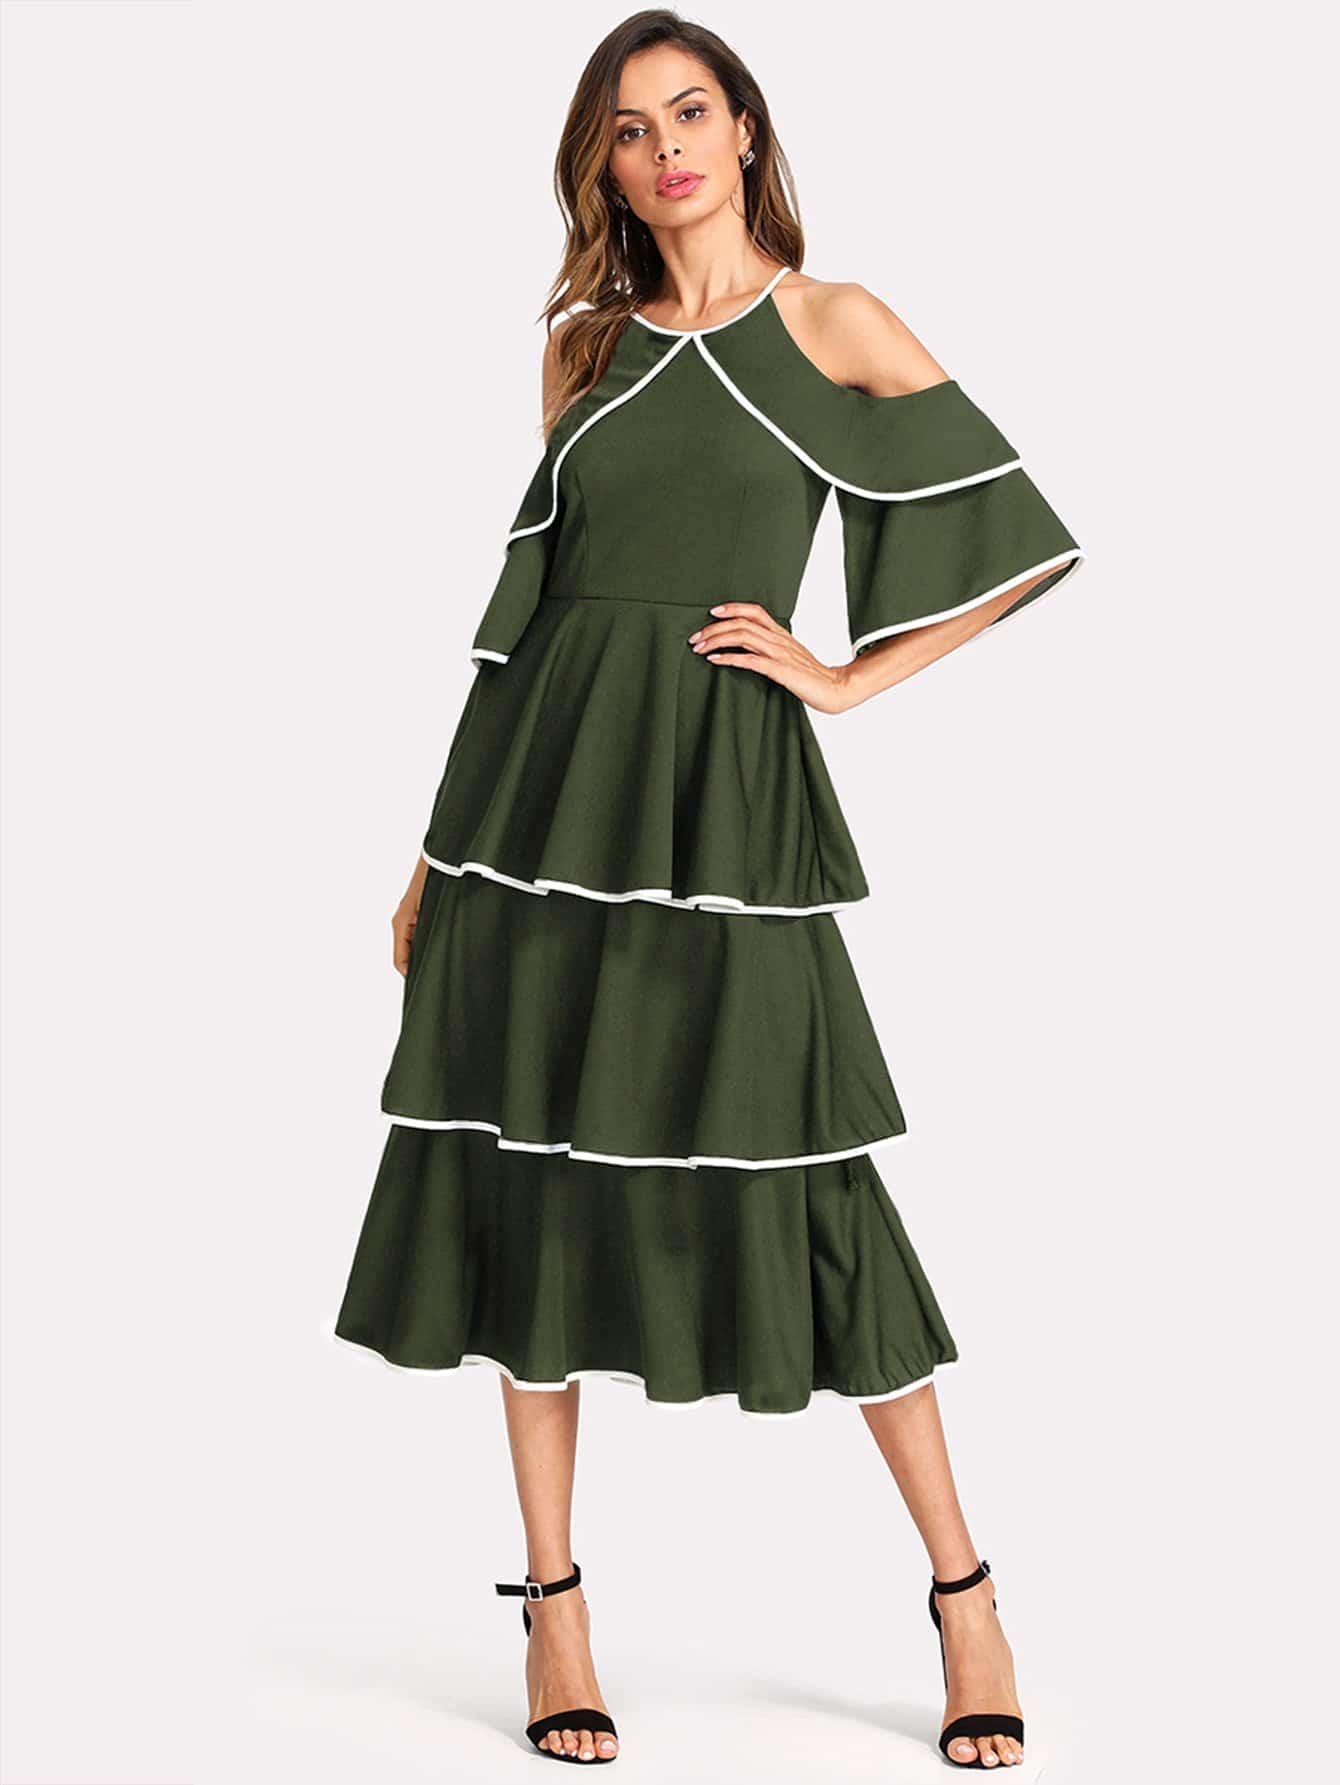 Contrast Binding Open Shoulder Tiered Flounce Dress